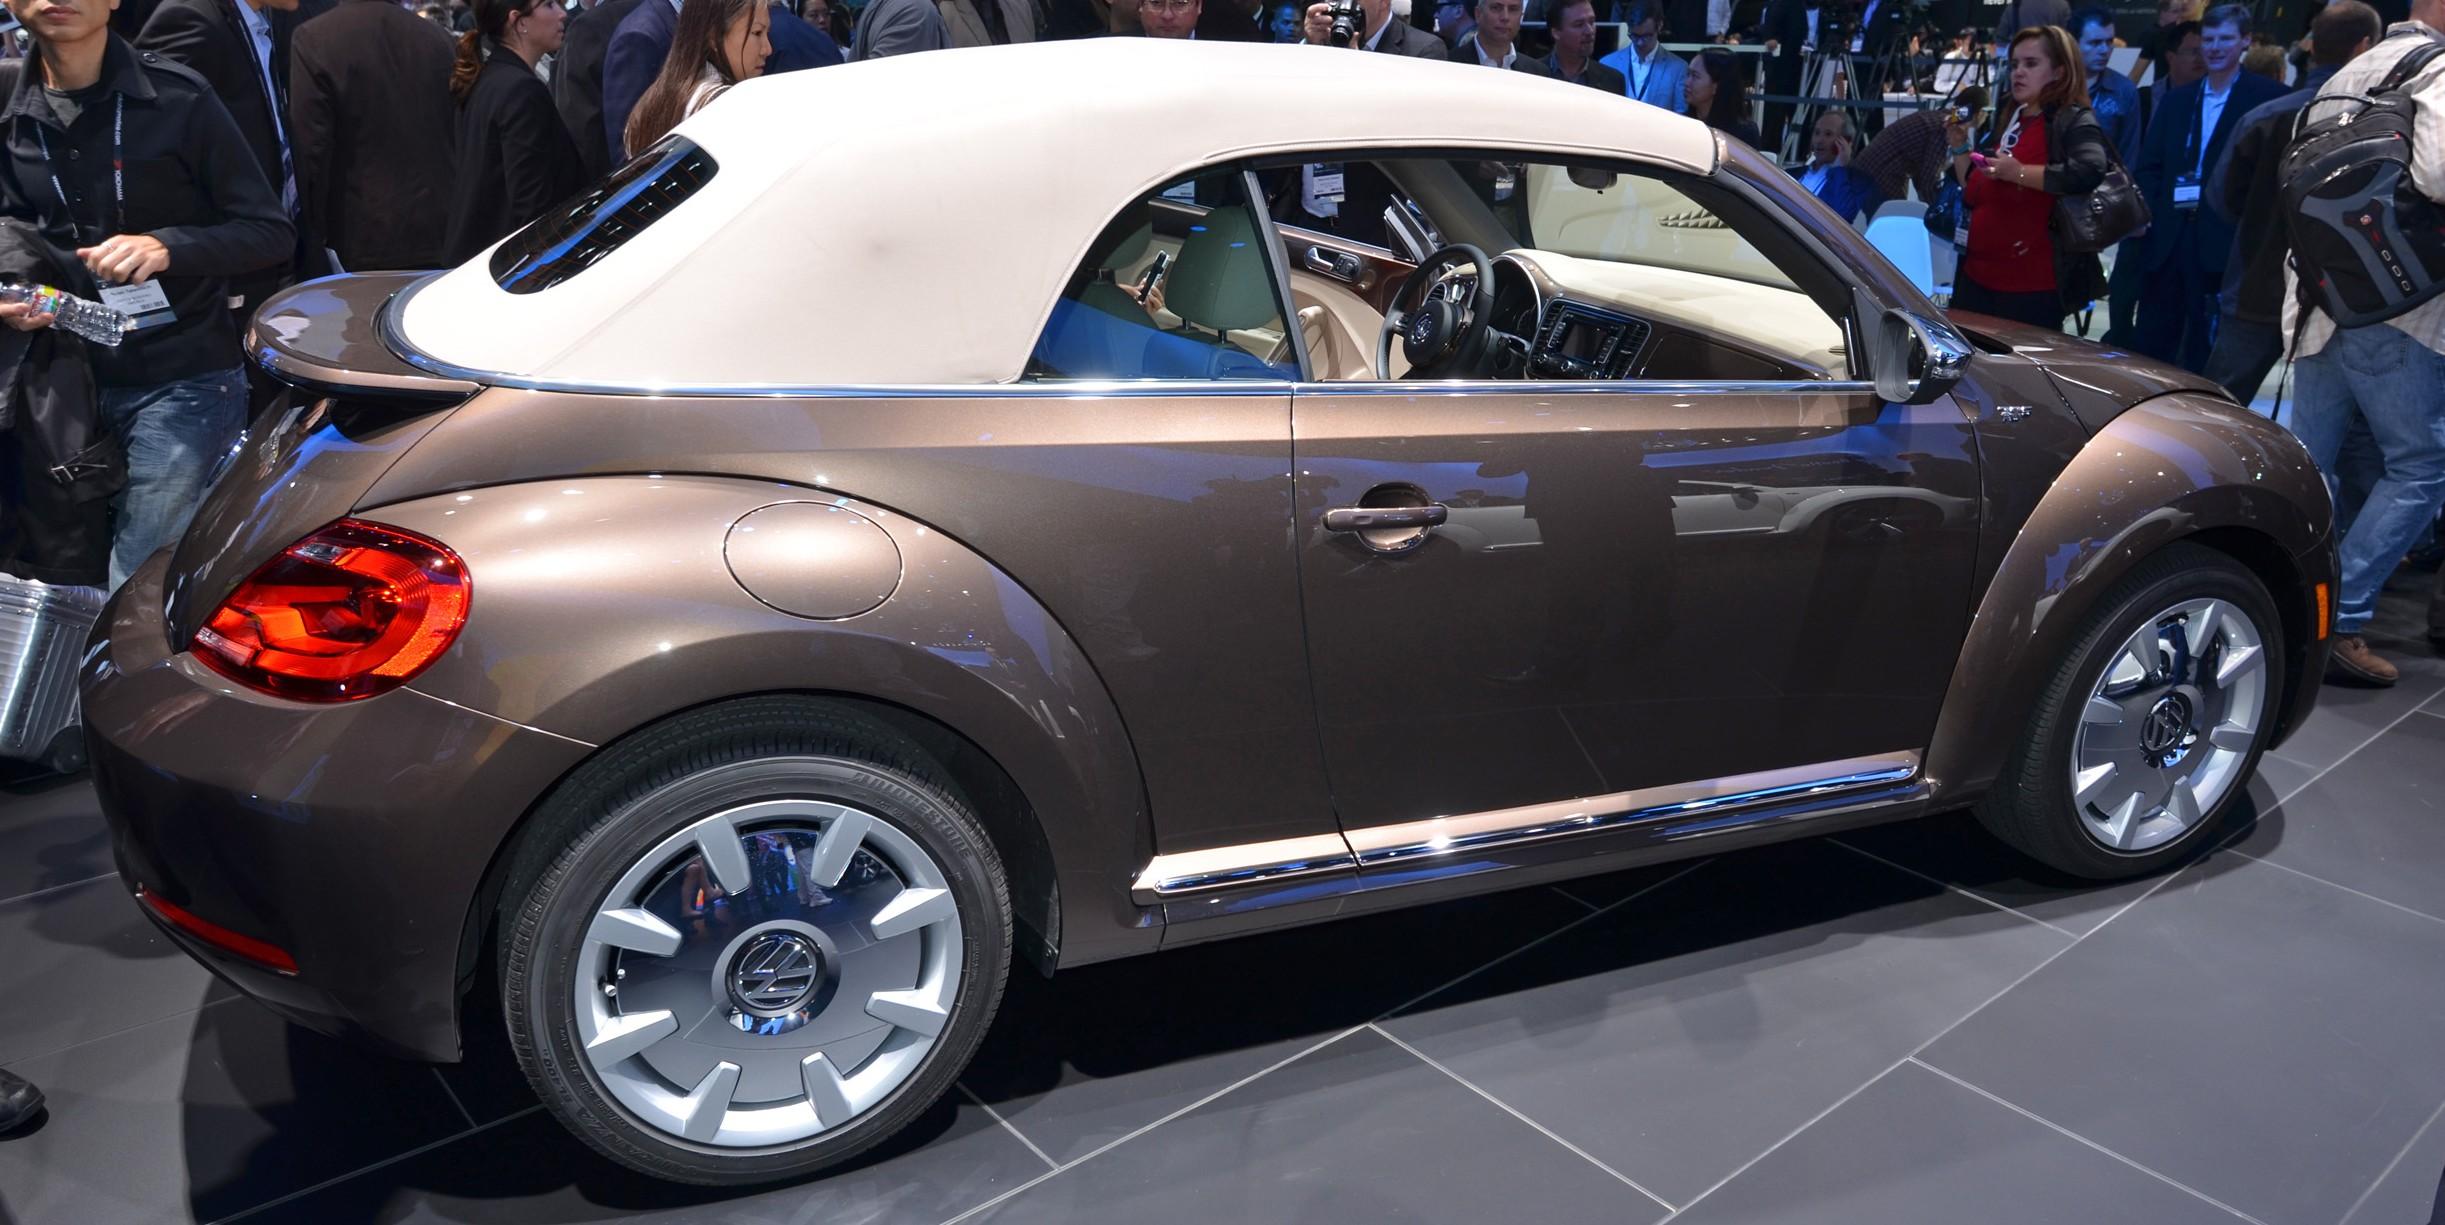 vw beetle cabrio history photos on better parts ltd. Black Bedroom Furniture Sets. Home Design Ideas